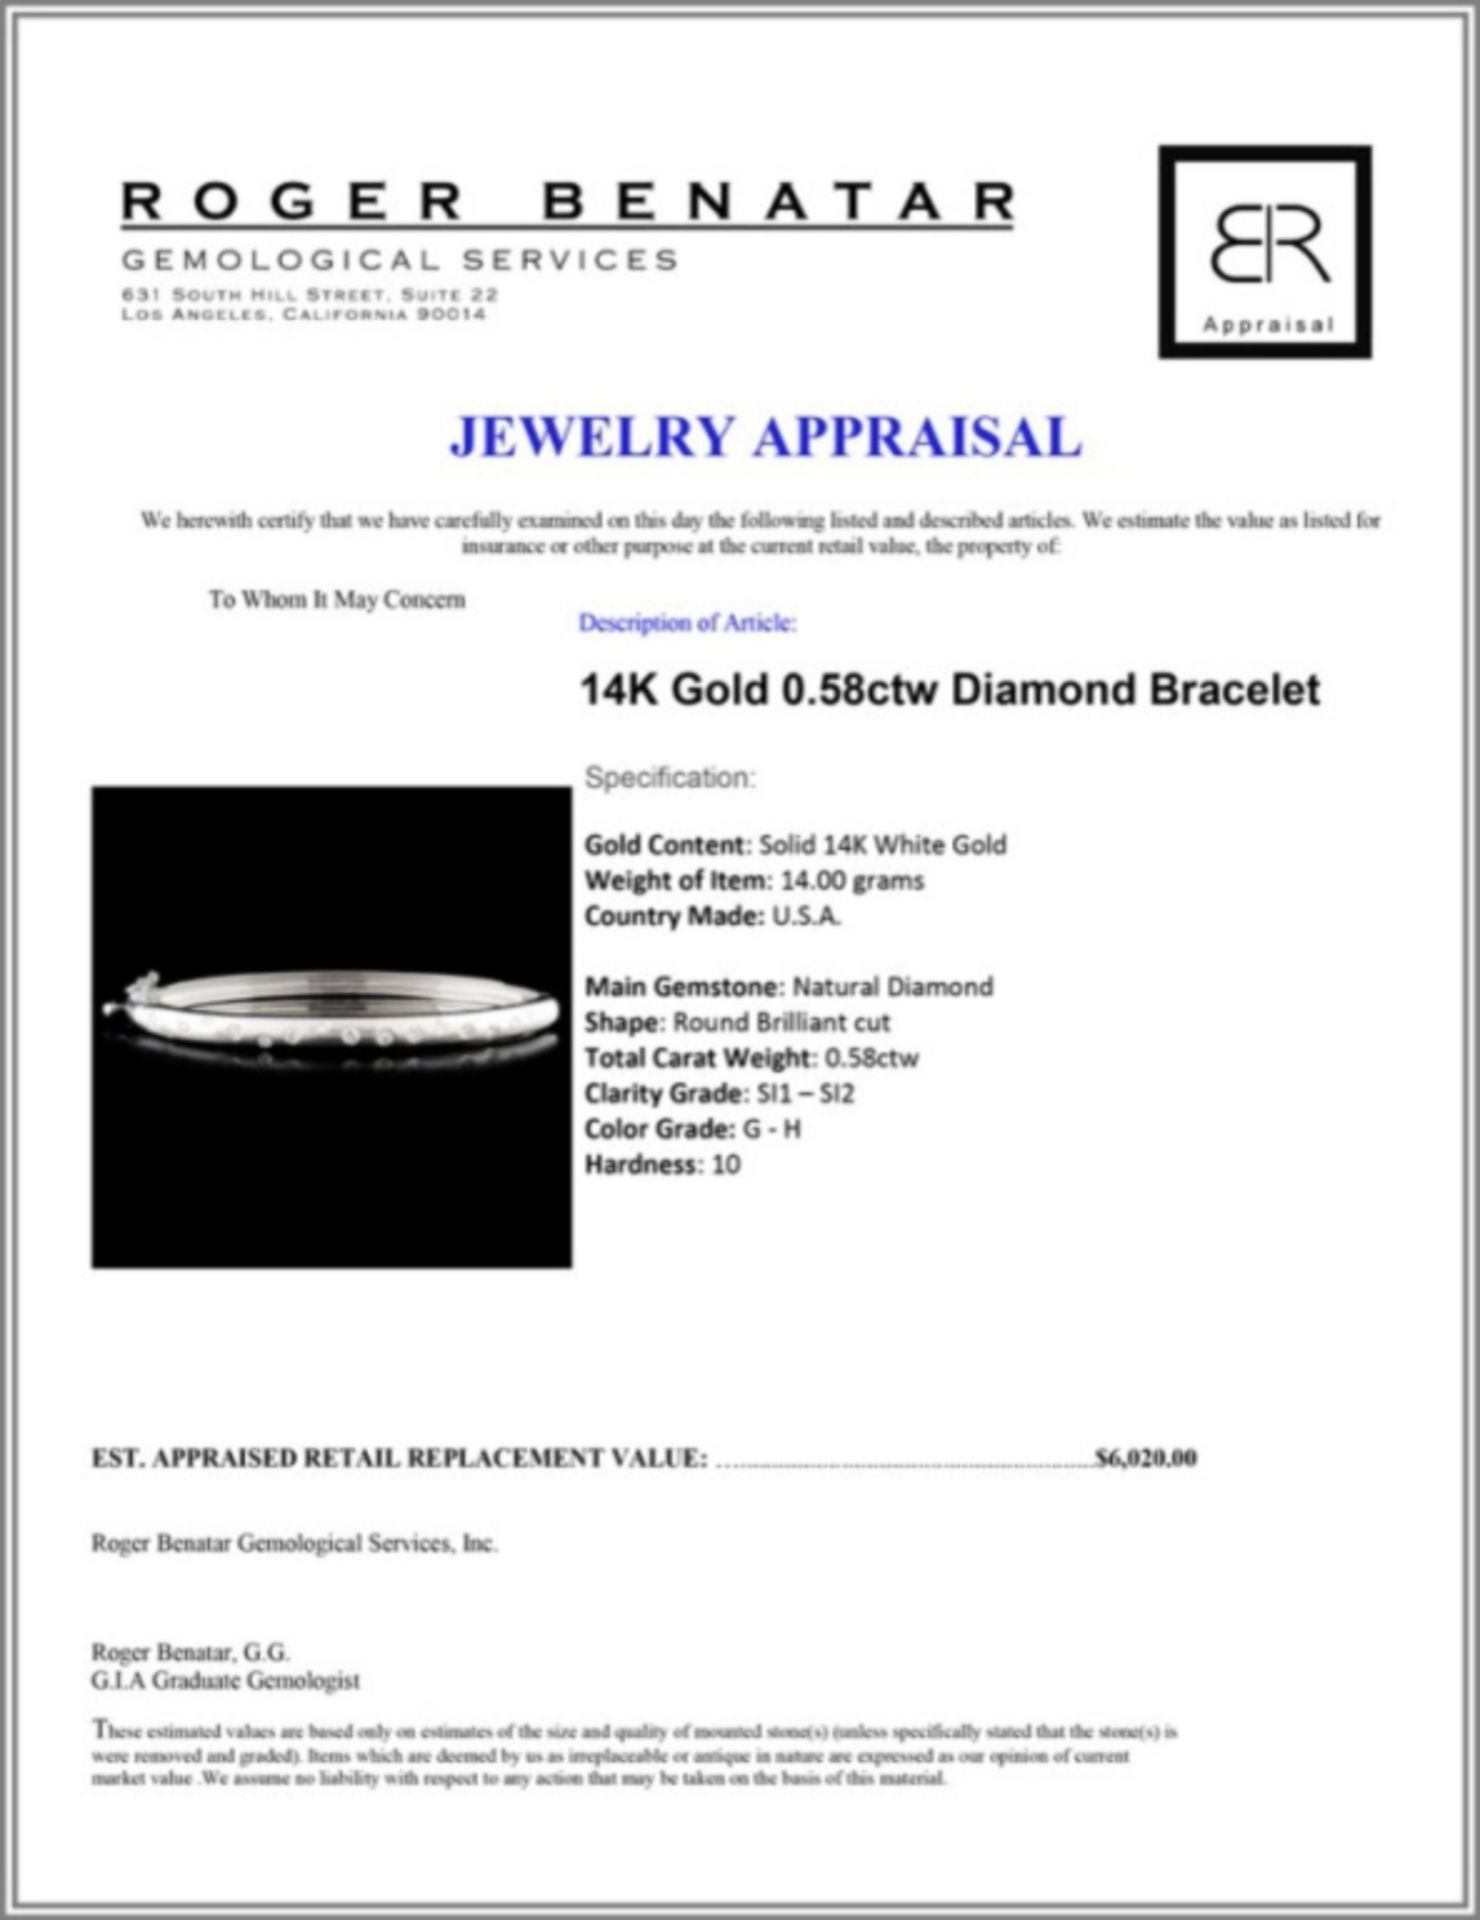 14K Gold 0.58ctw Diamond Bracelet - Image 3 of 3